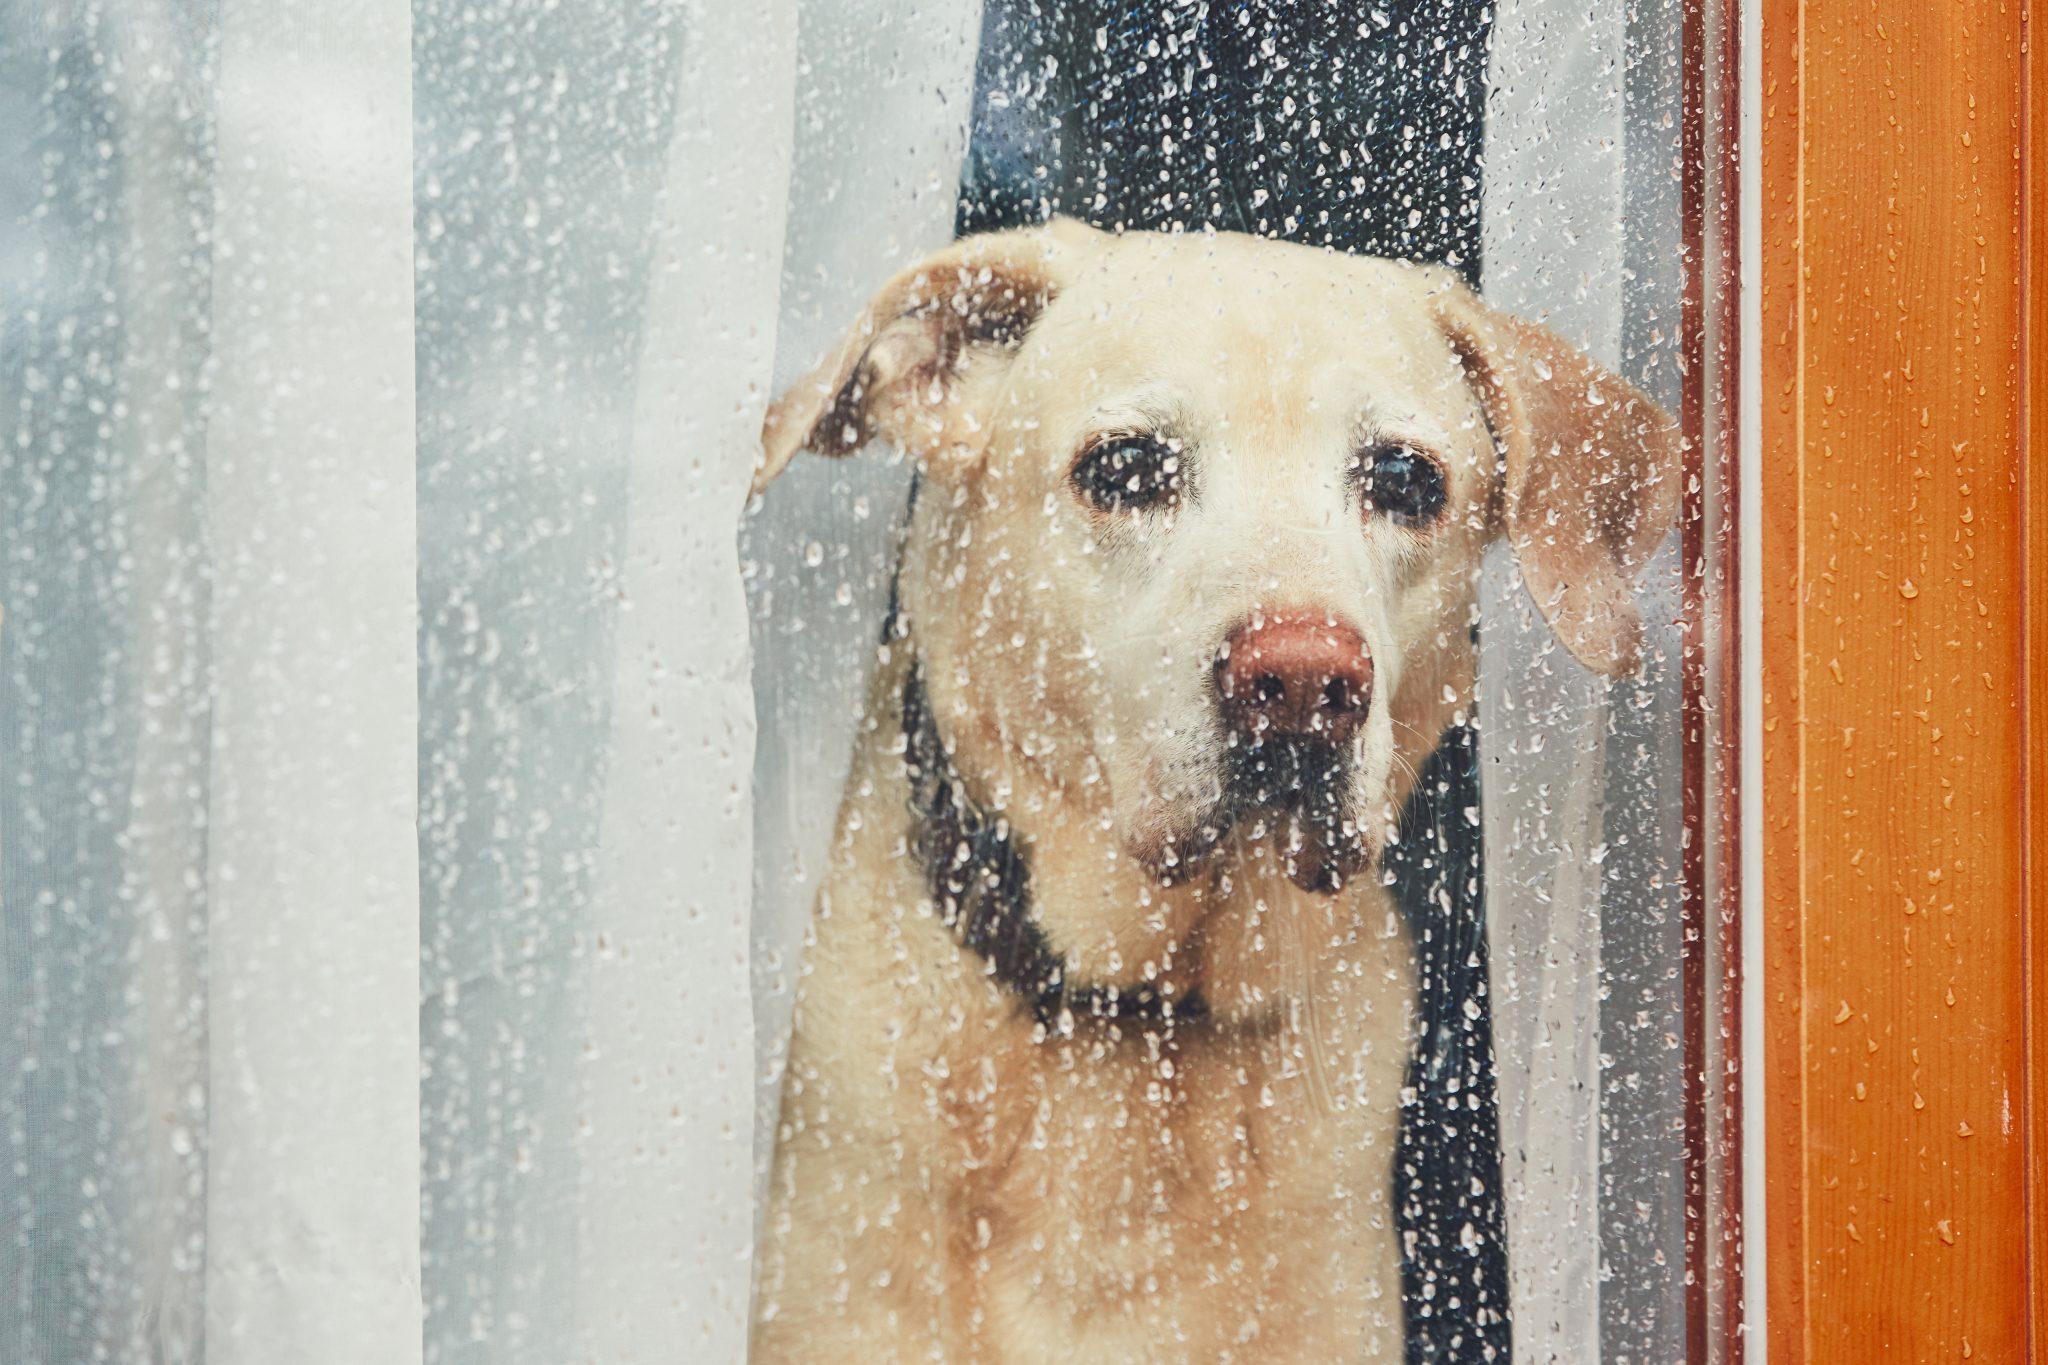 dog boarding kennels - Woofs & Wags